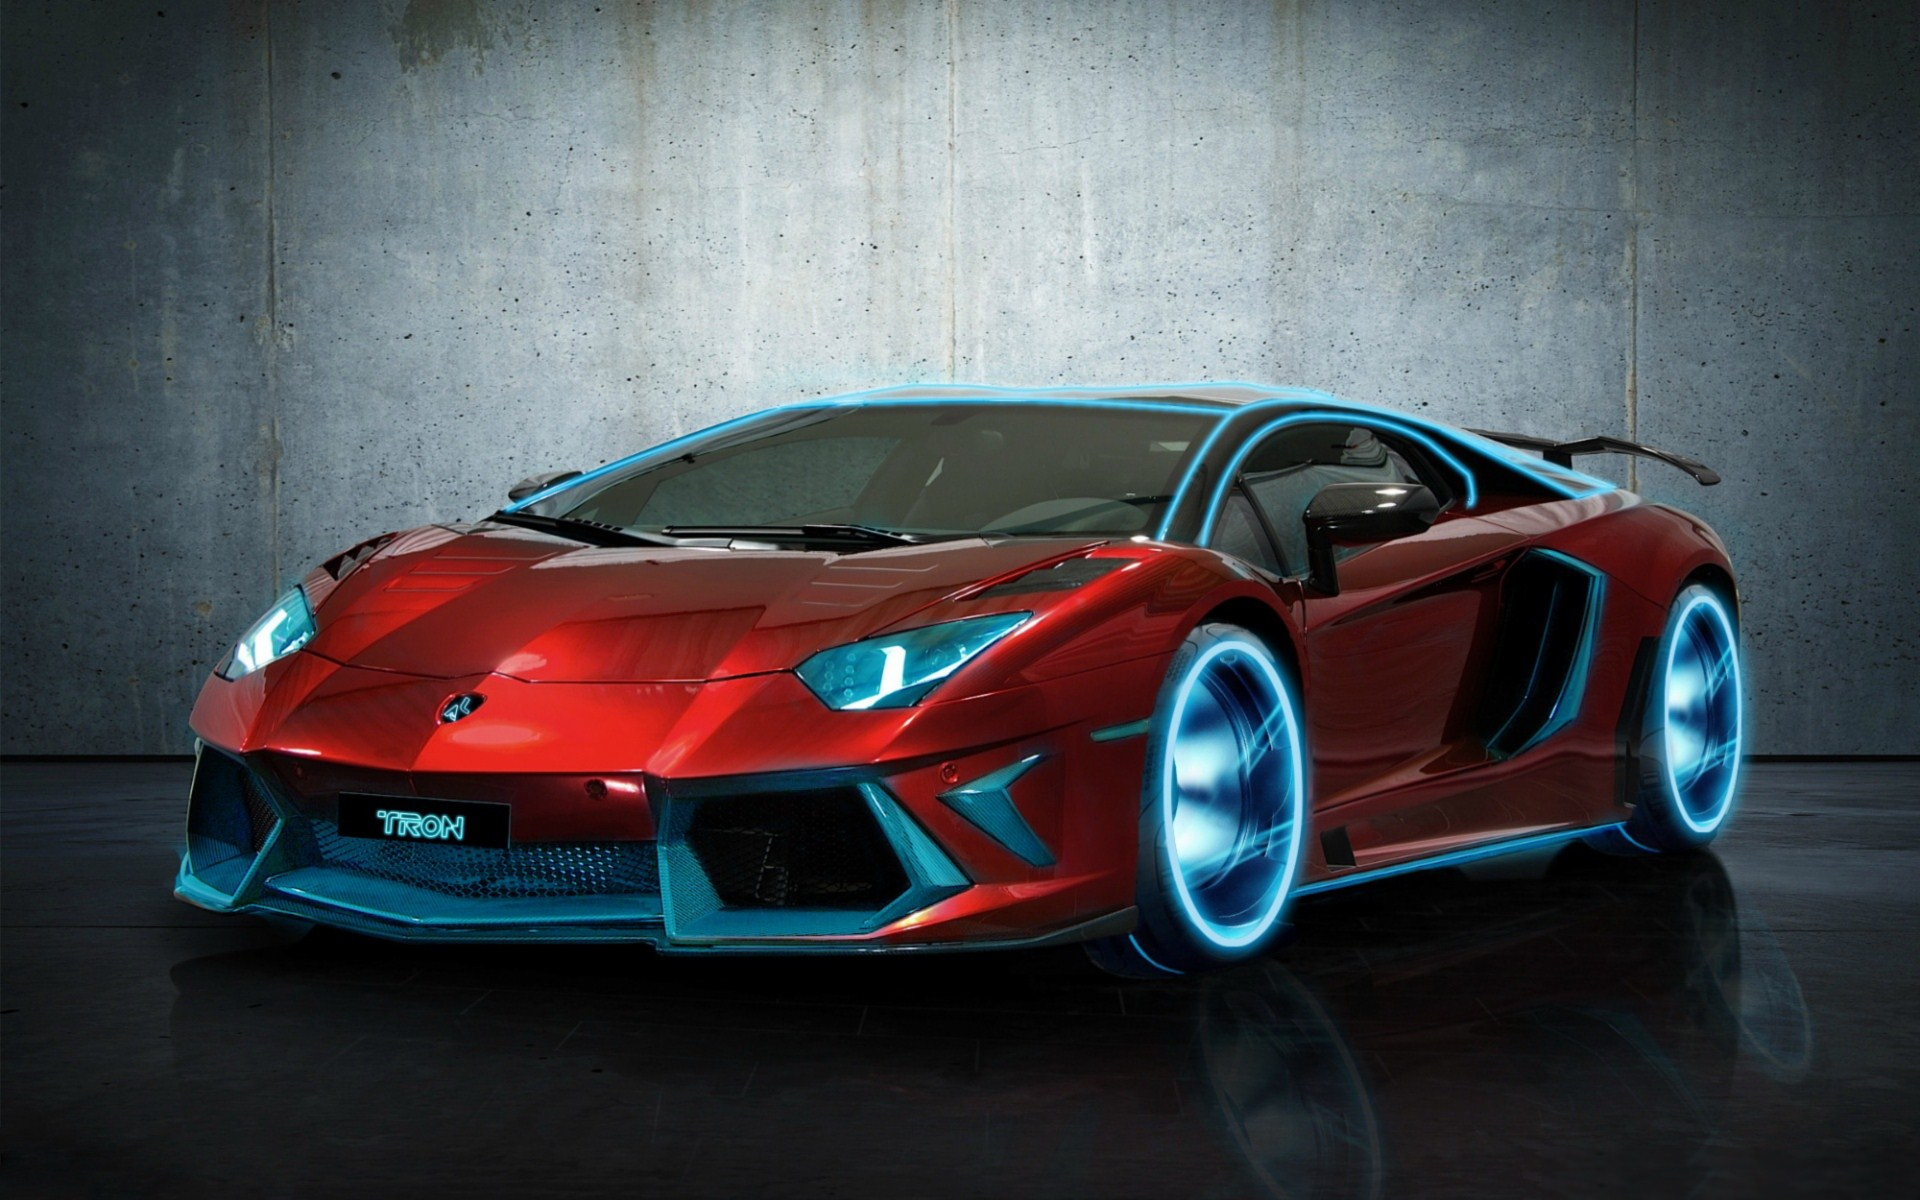 Lamborghini Aventador HD Wallpaper Desktop ImageBankbiz 1920x1200